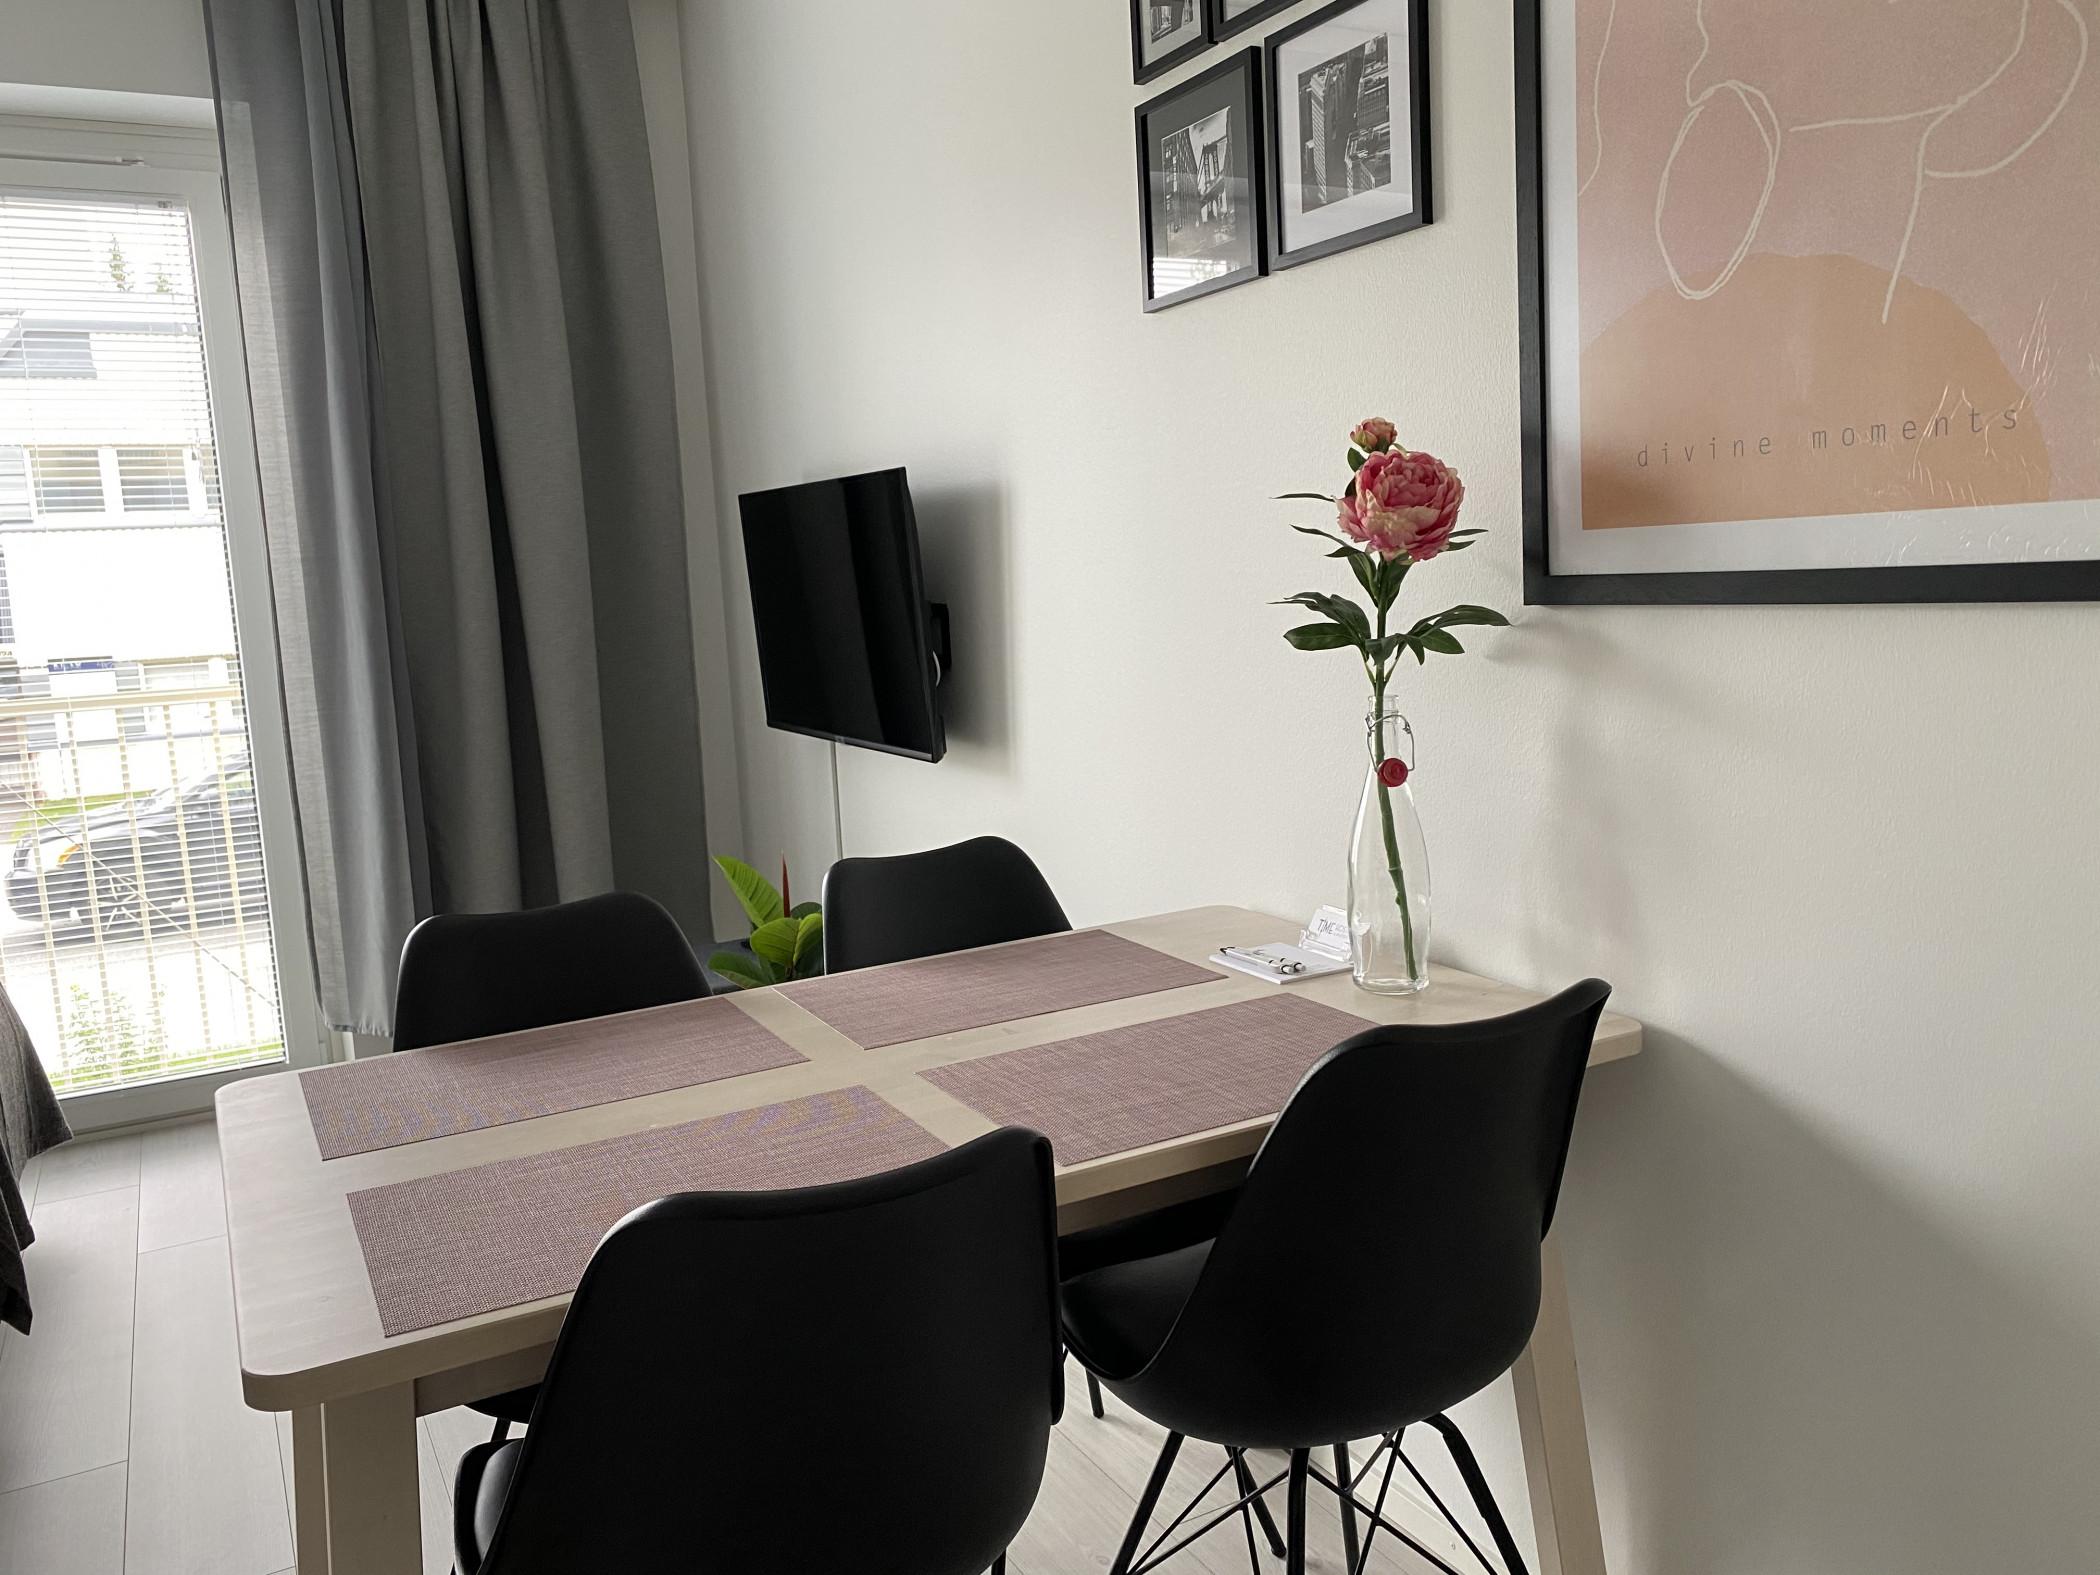 Time Apartments Ylistönmäentie 33 A 4